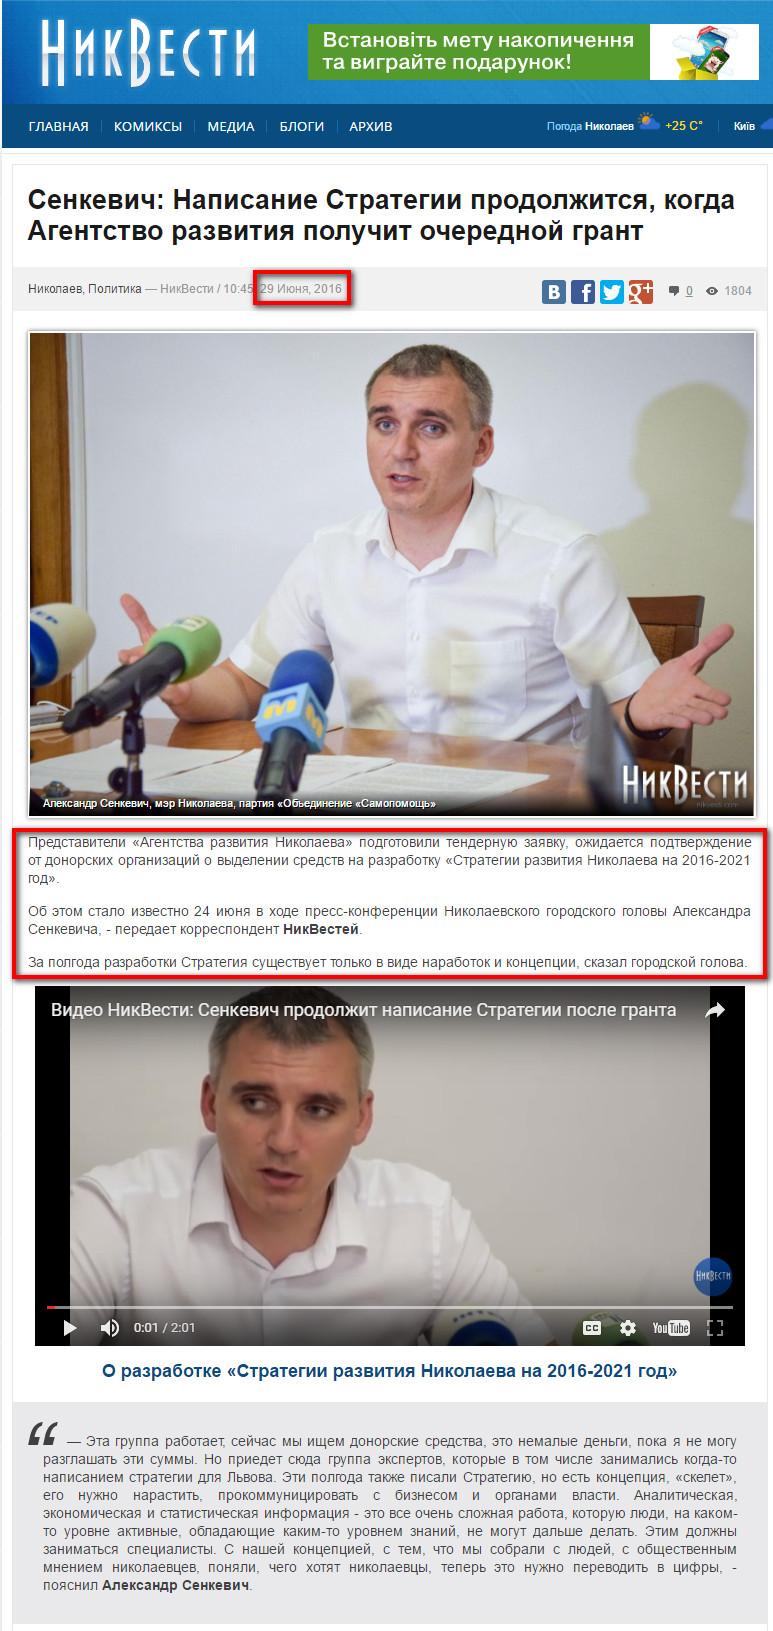 http://nikvesti.com/news/politics/89952